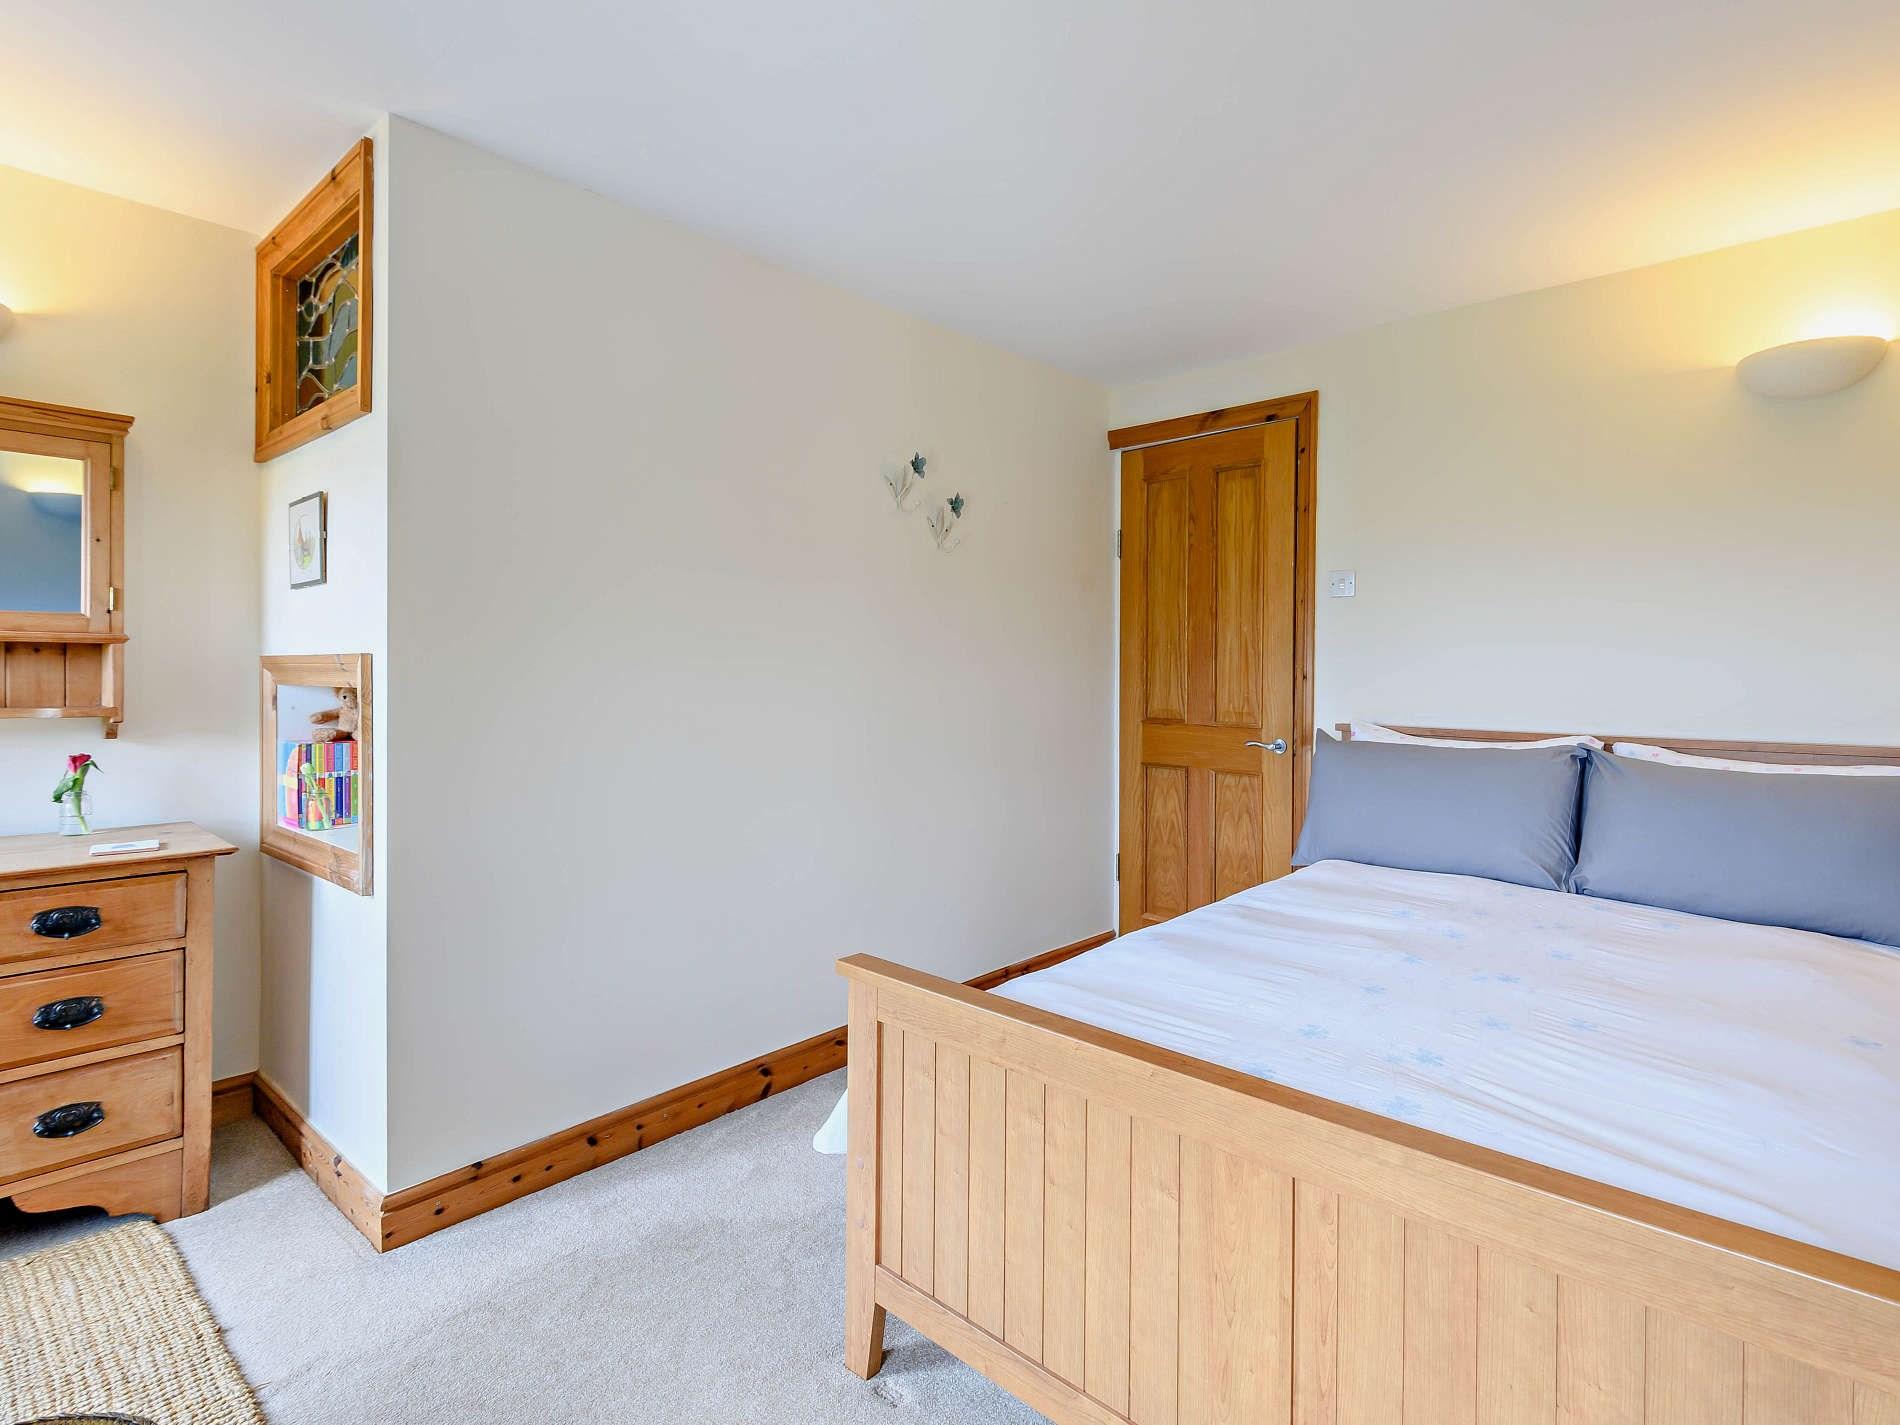 2 Bedroom Cottage in Norfolk, East Anglia